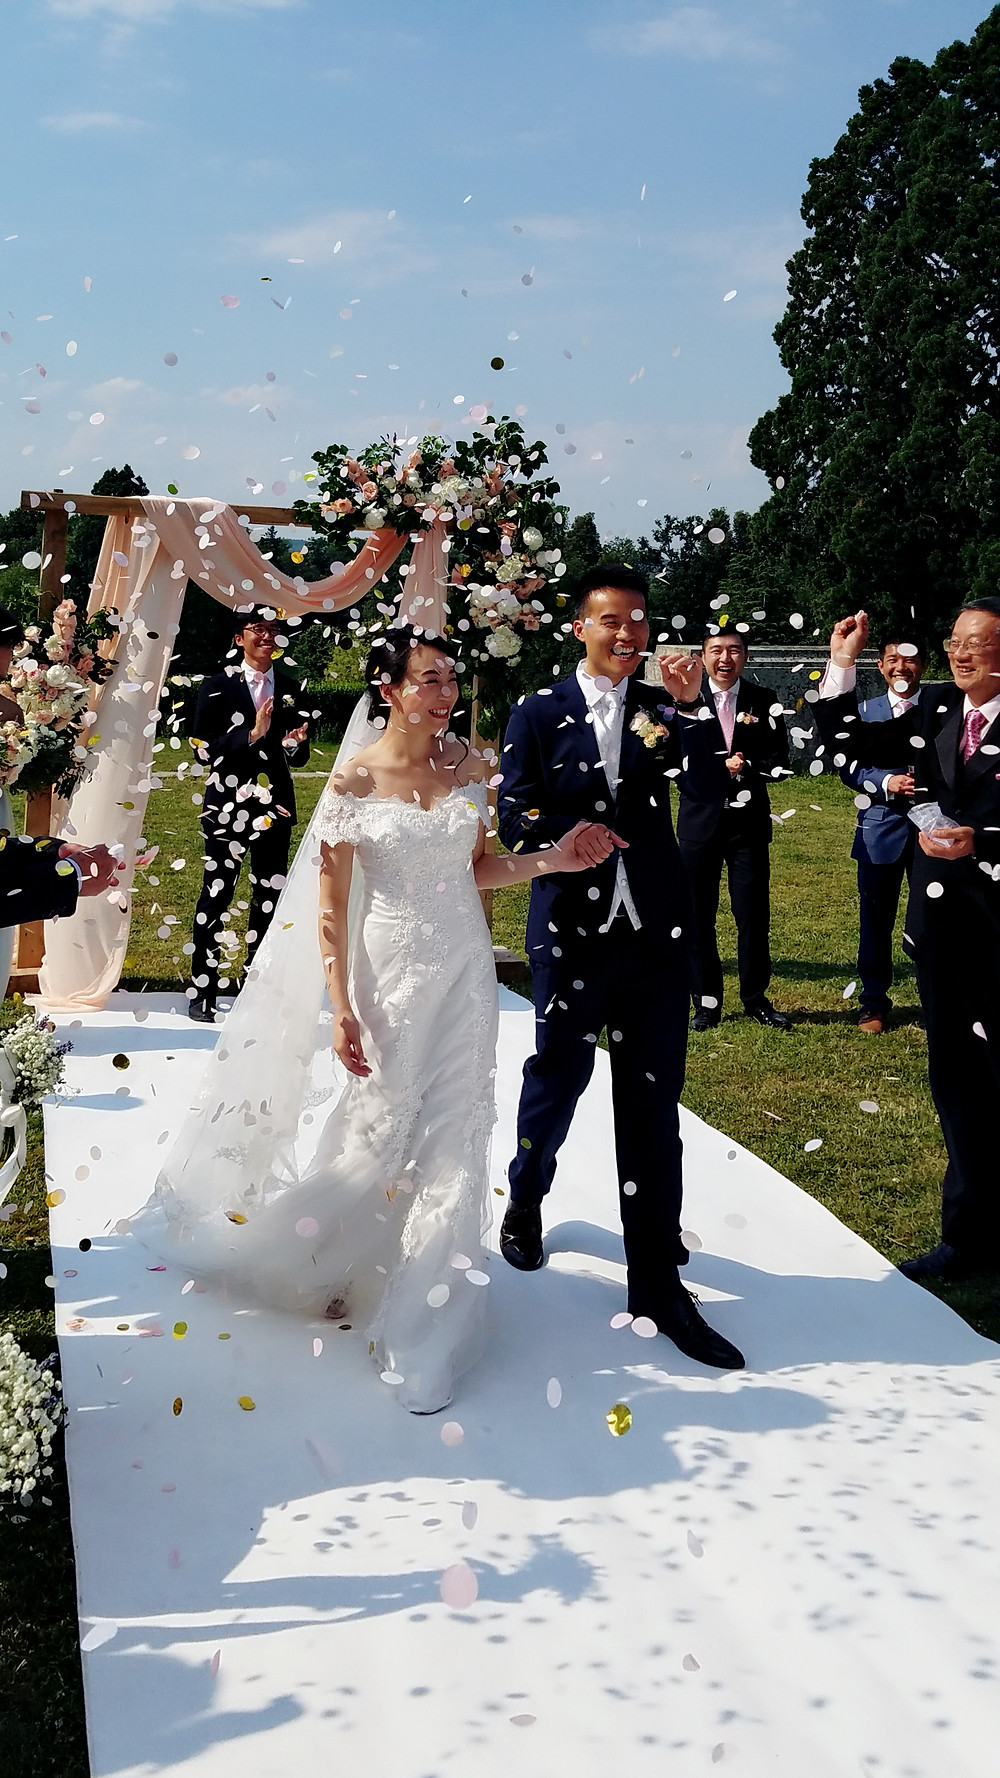 sortie , recessional music, wedding in france, wedding planning paris, destination wedding france